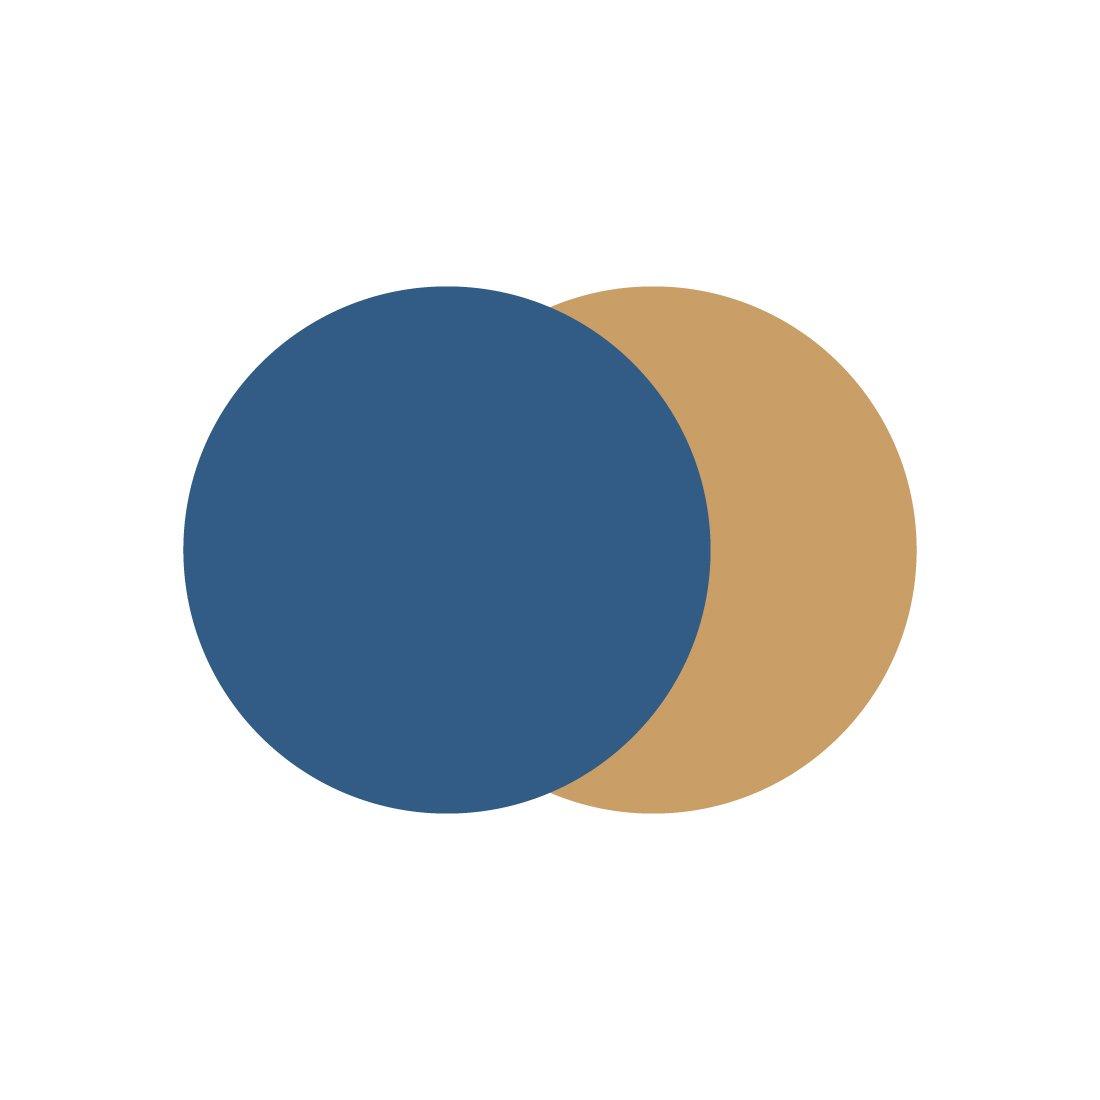 Marset Scotch Plafondlamp Blauw - Goud